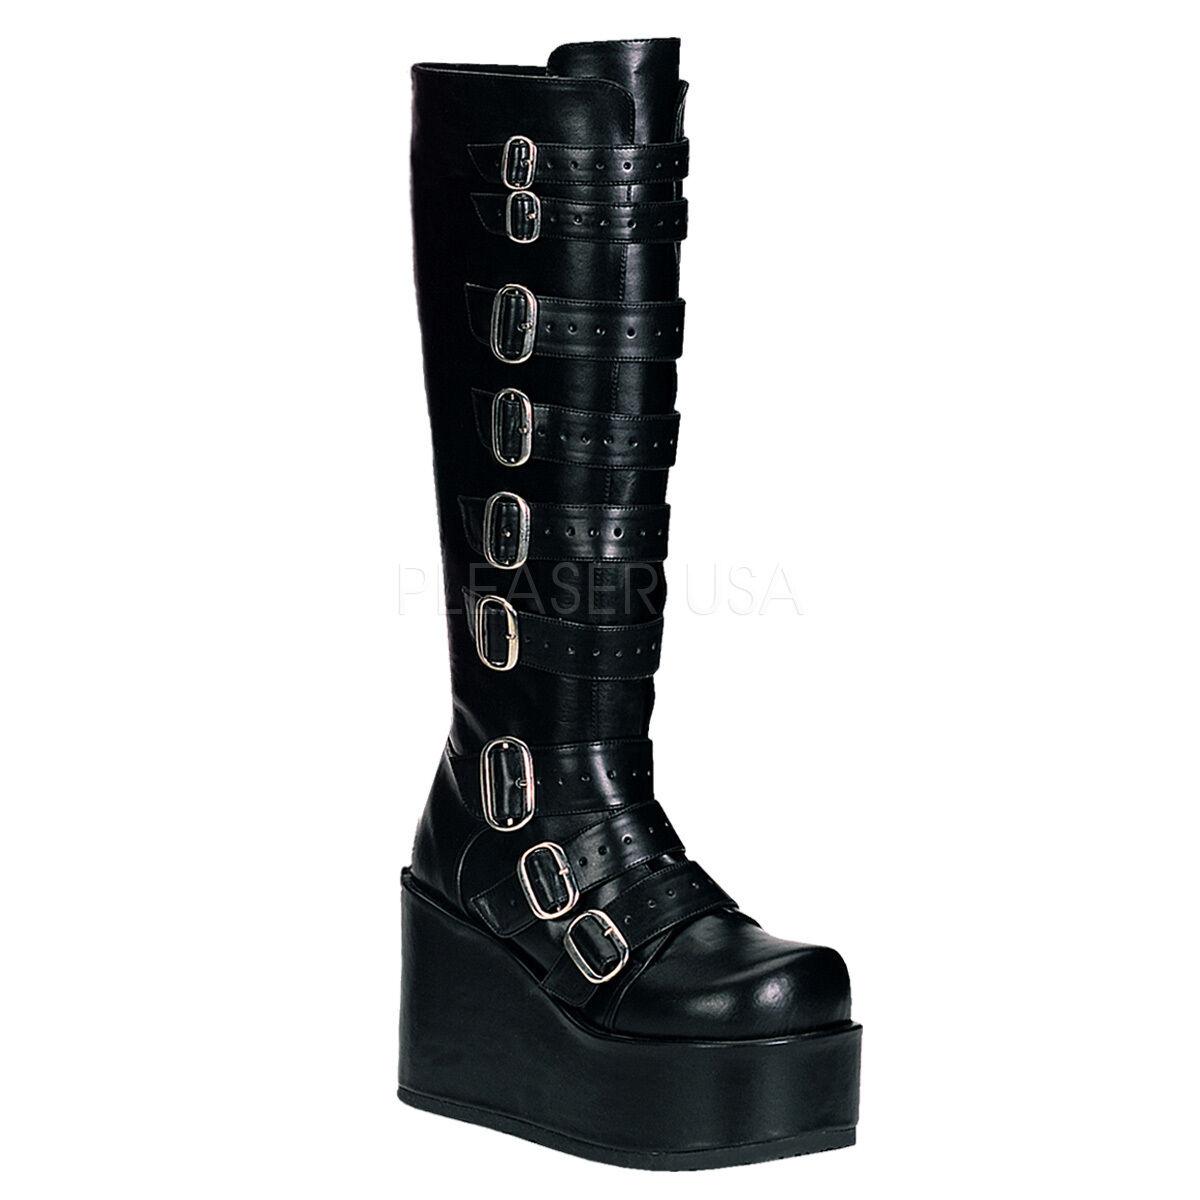 DEMONIA CONCORD-108 Women's Punk Gothic Black Buckle Strap Platform Knee Boots